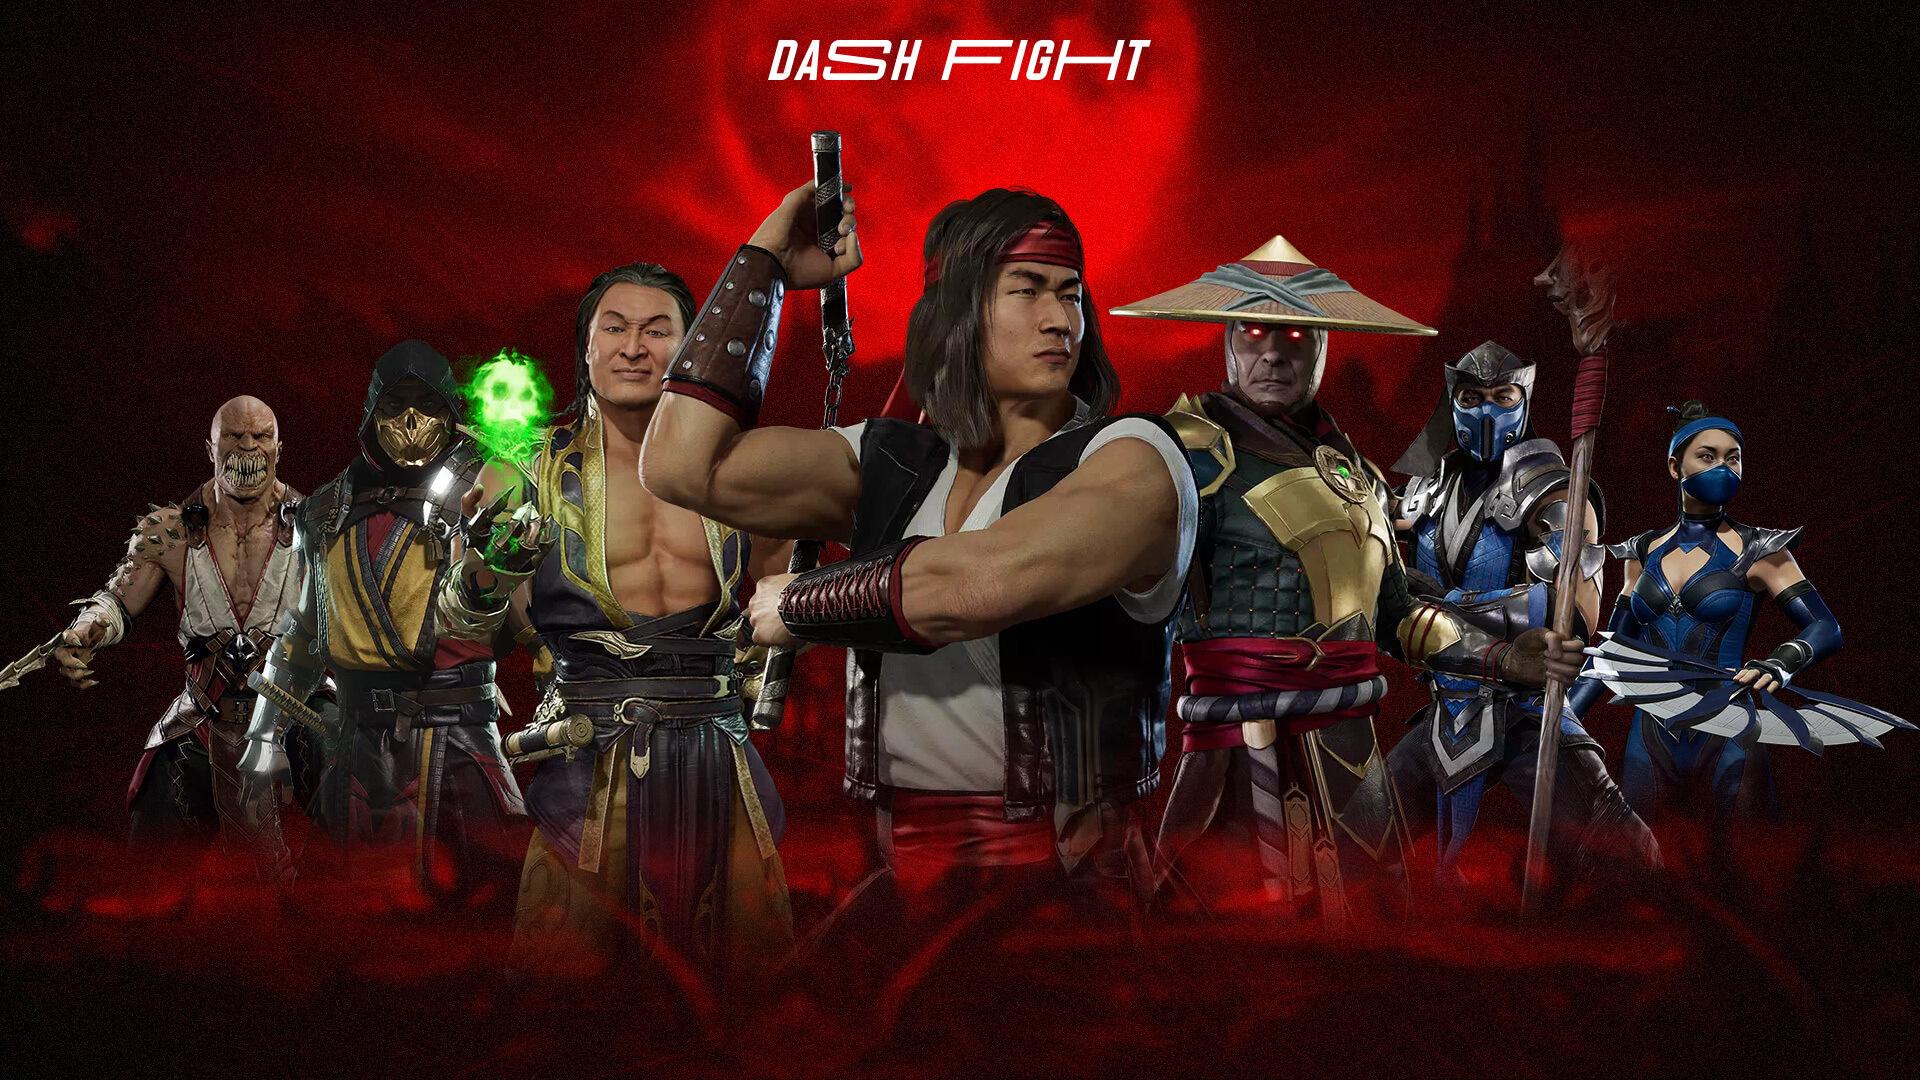 Story and Lore of Mortal Kombat series